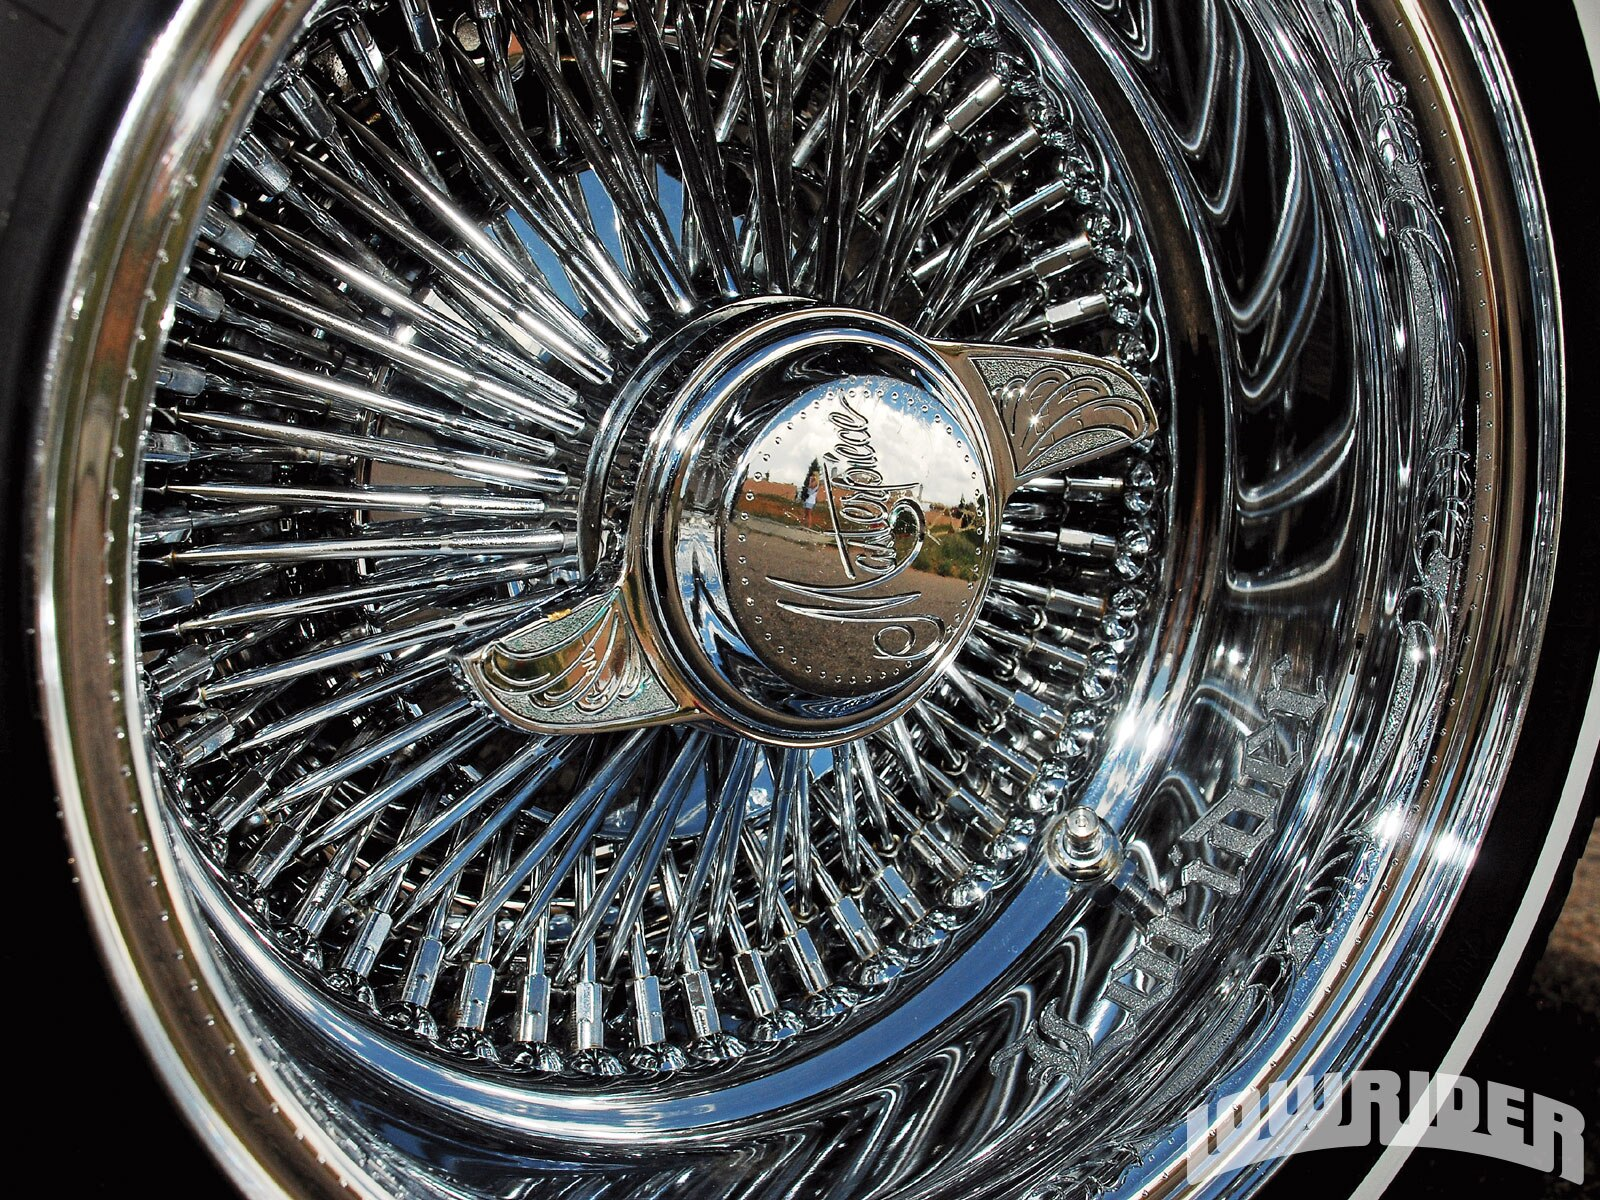 1984 Cadillac Coupe DeVille Lowrider Magazine